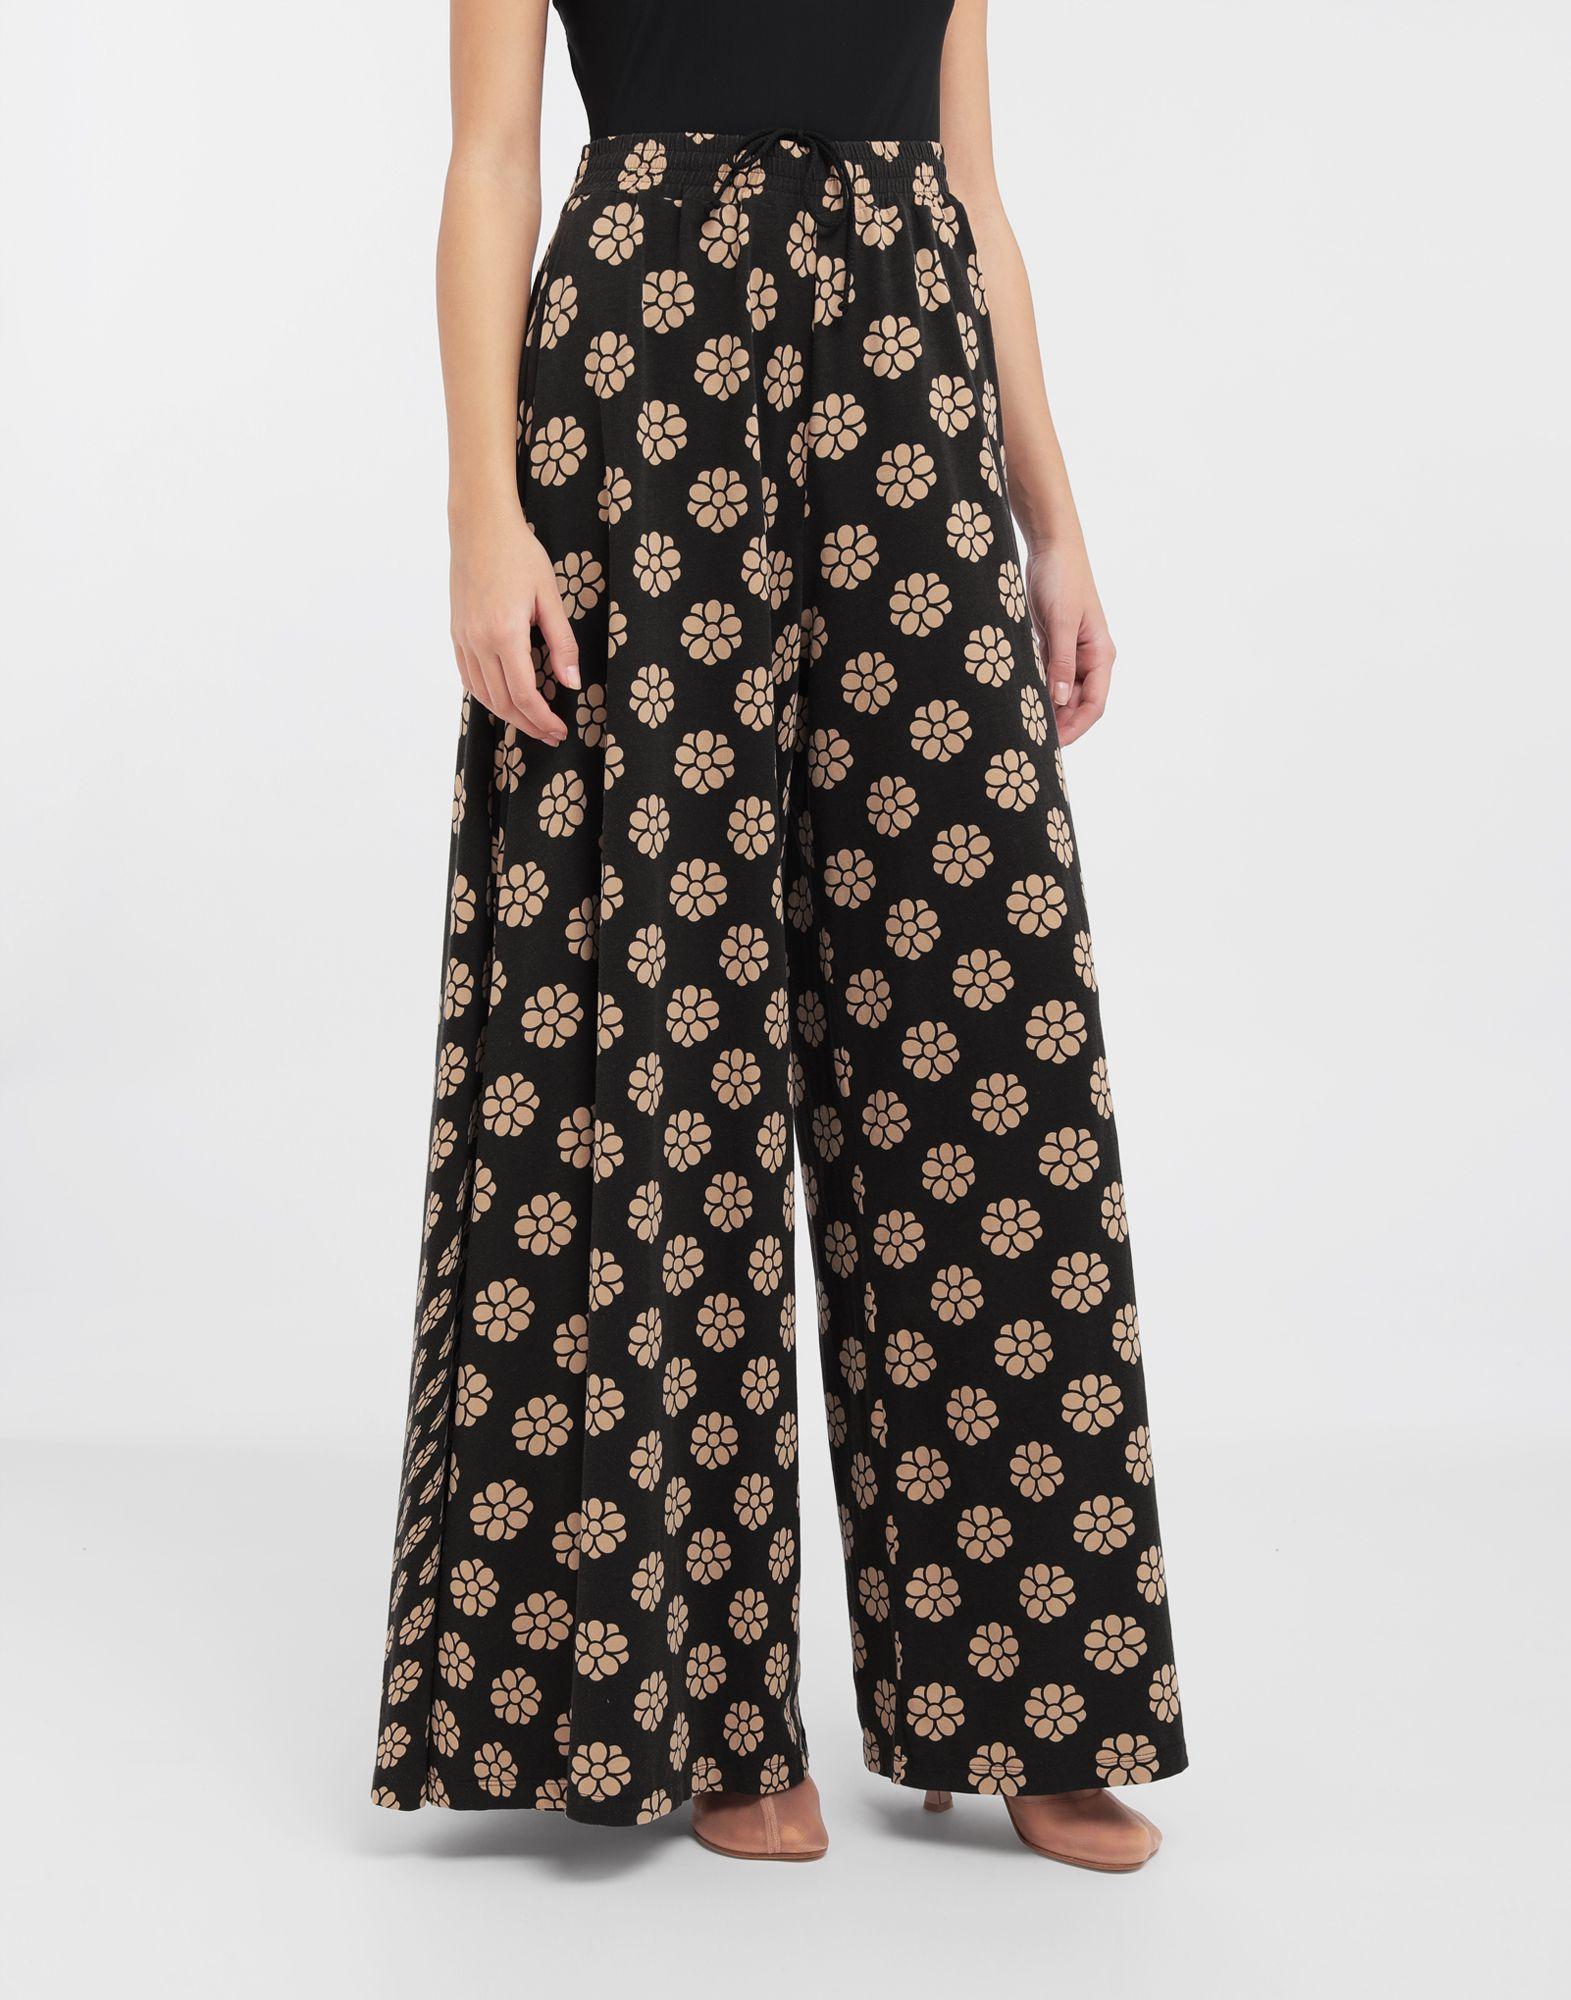 MM6 MAISON MARGIELA Polka dot flower-print pants Trousers Woman r